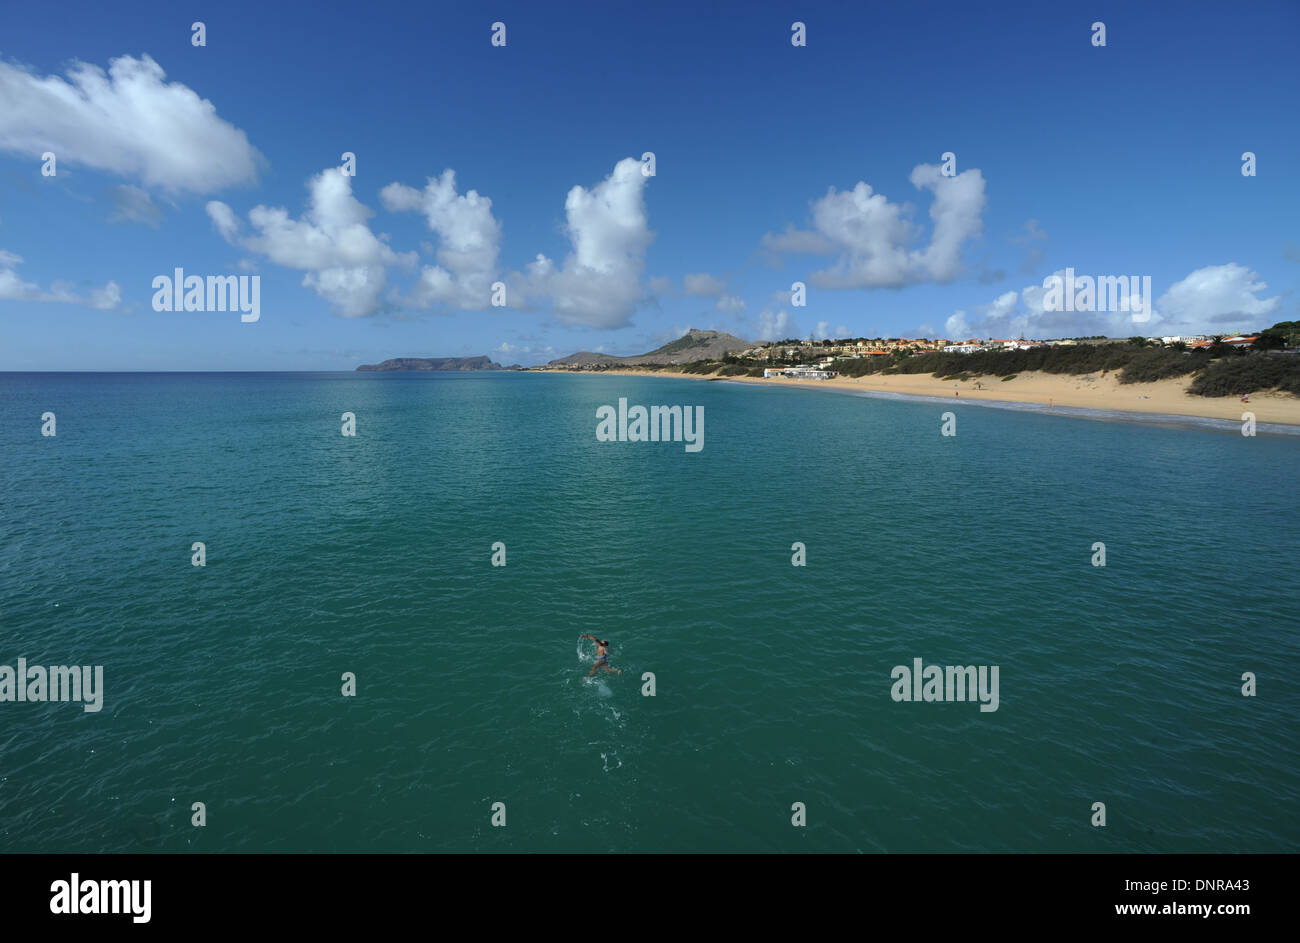 The Island of Porto Santo Madeira - Stock Image